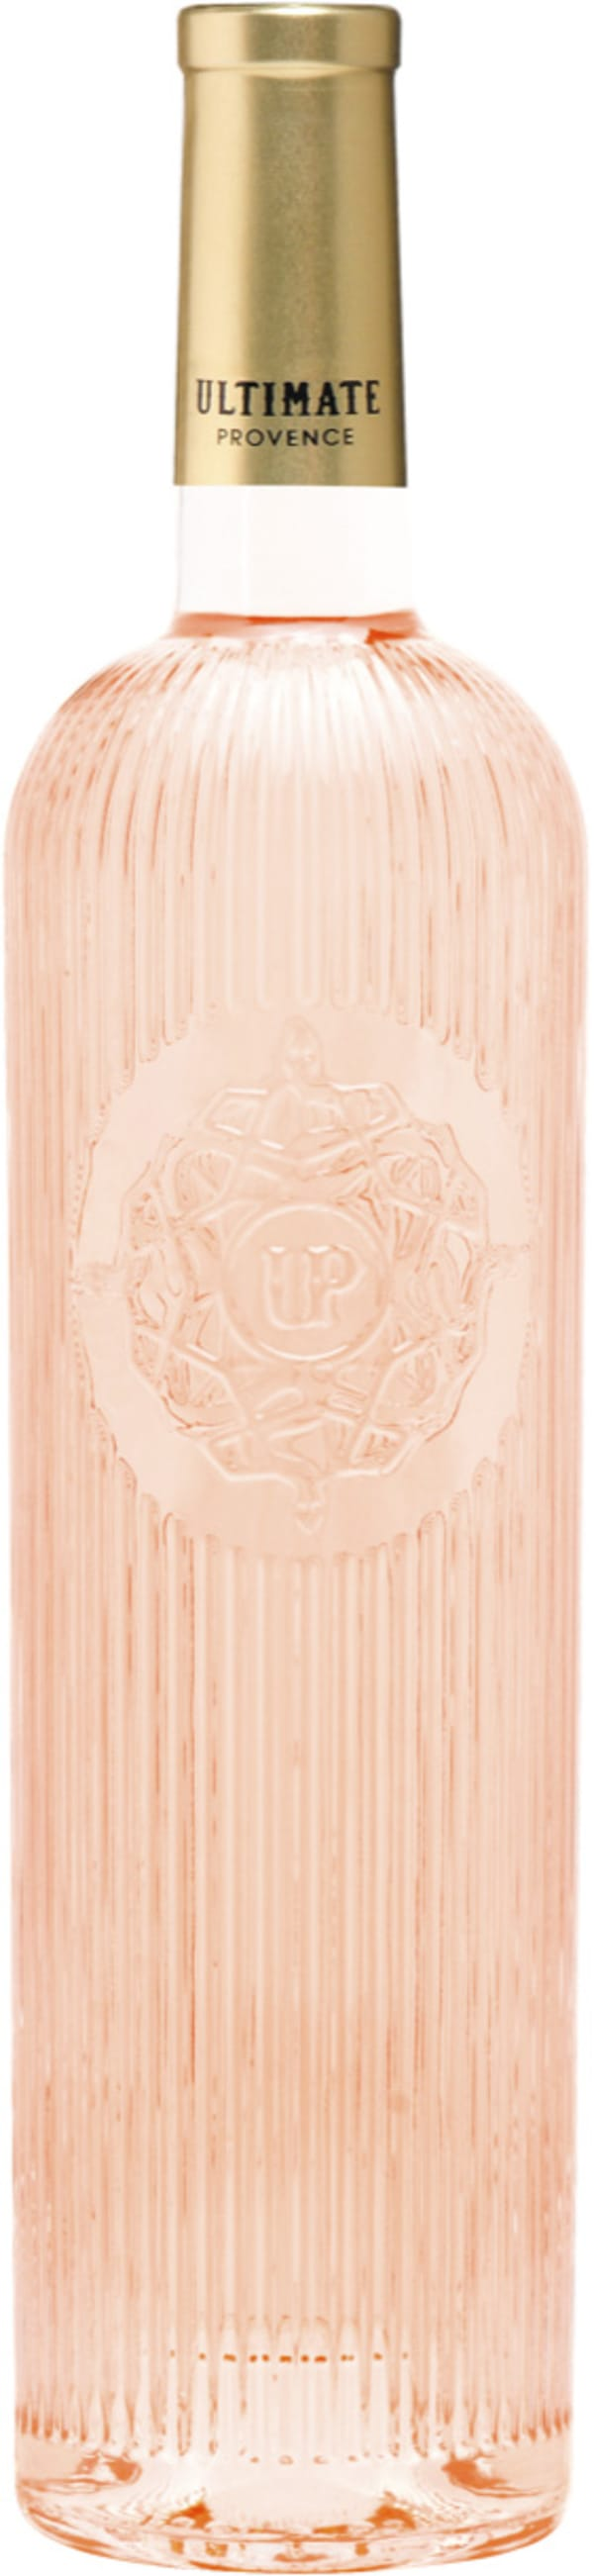 Ultimate Provence Rosé 2020